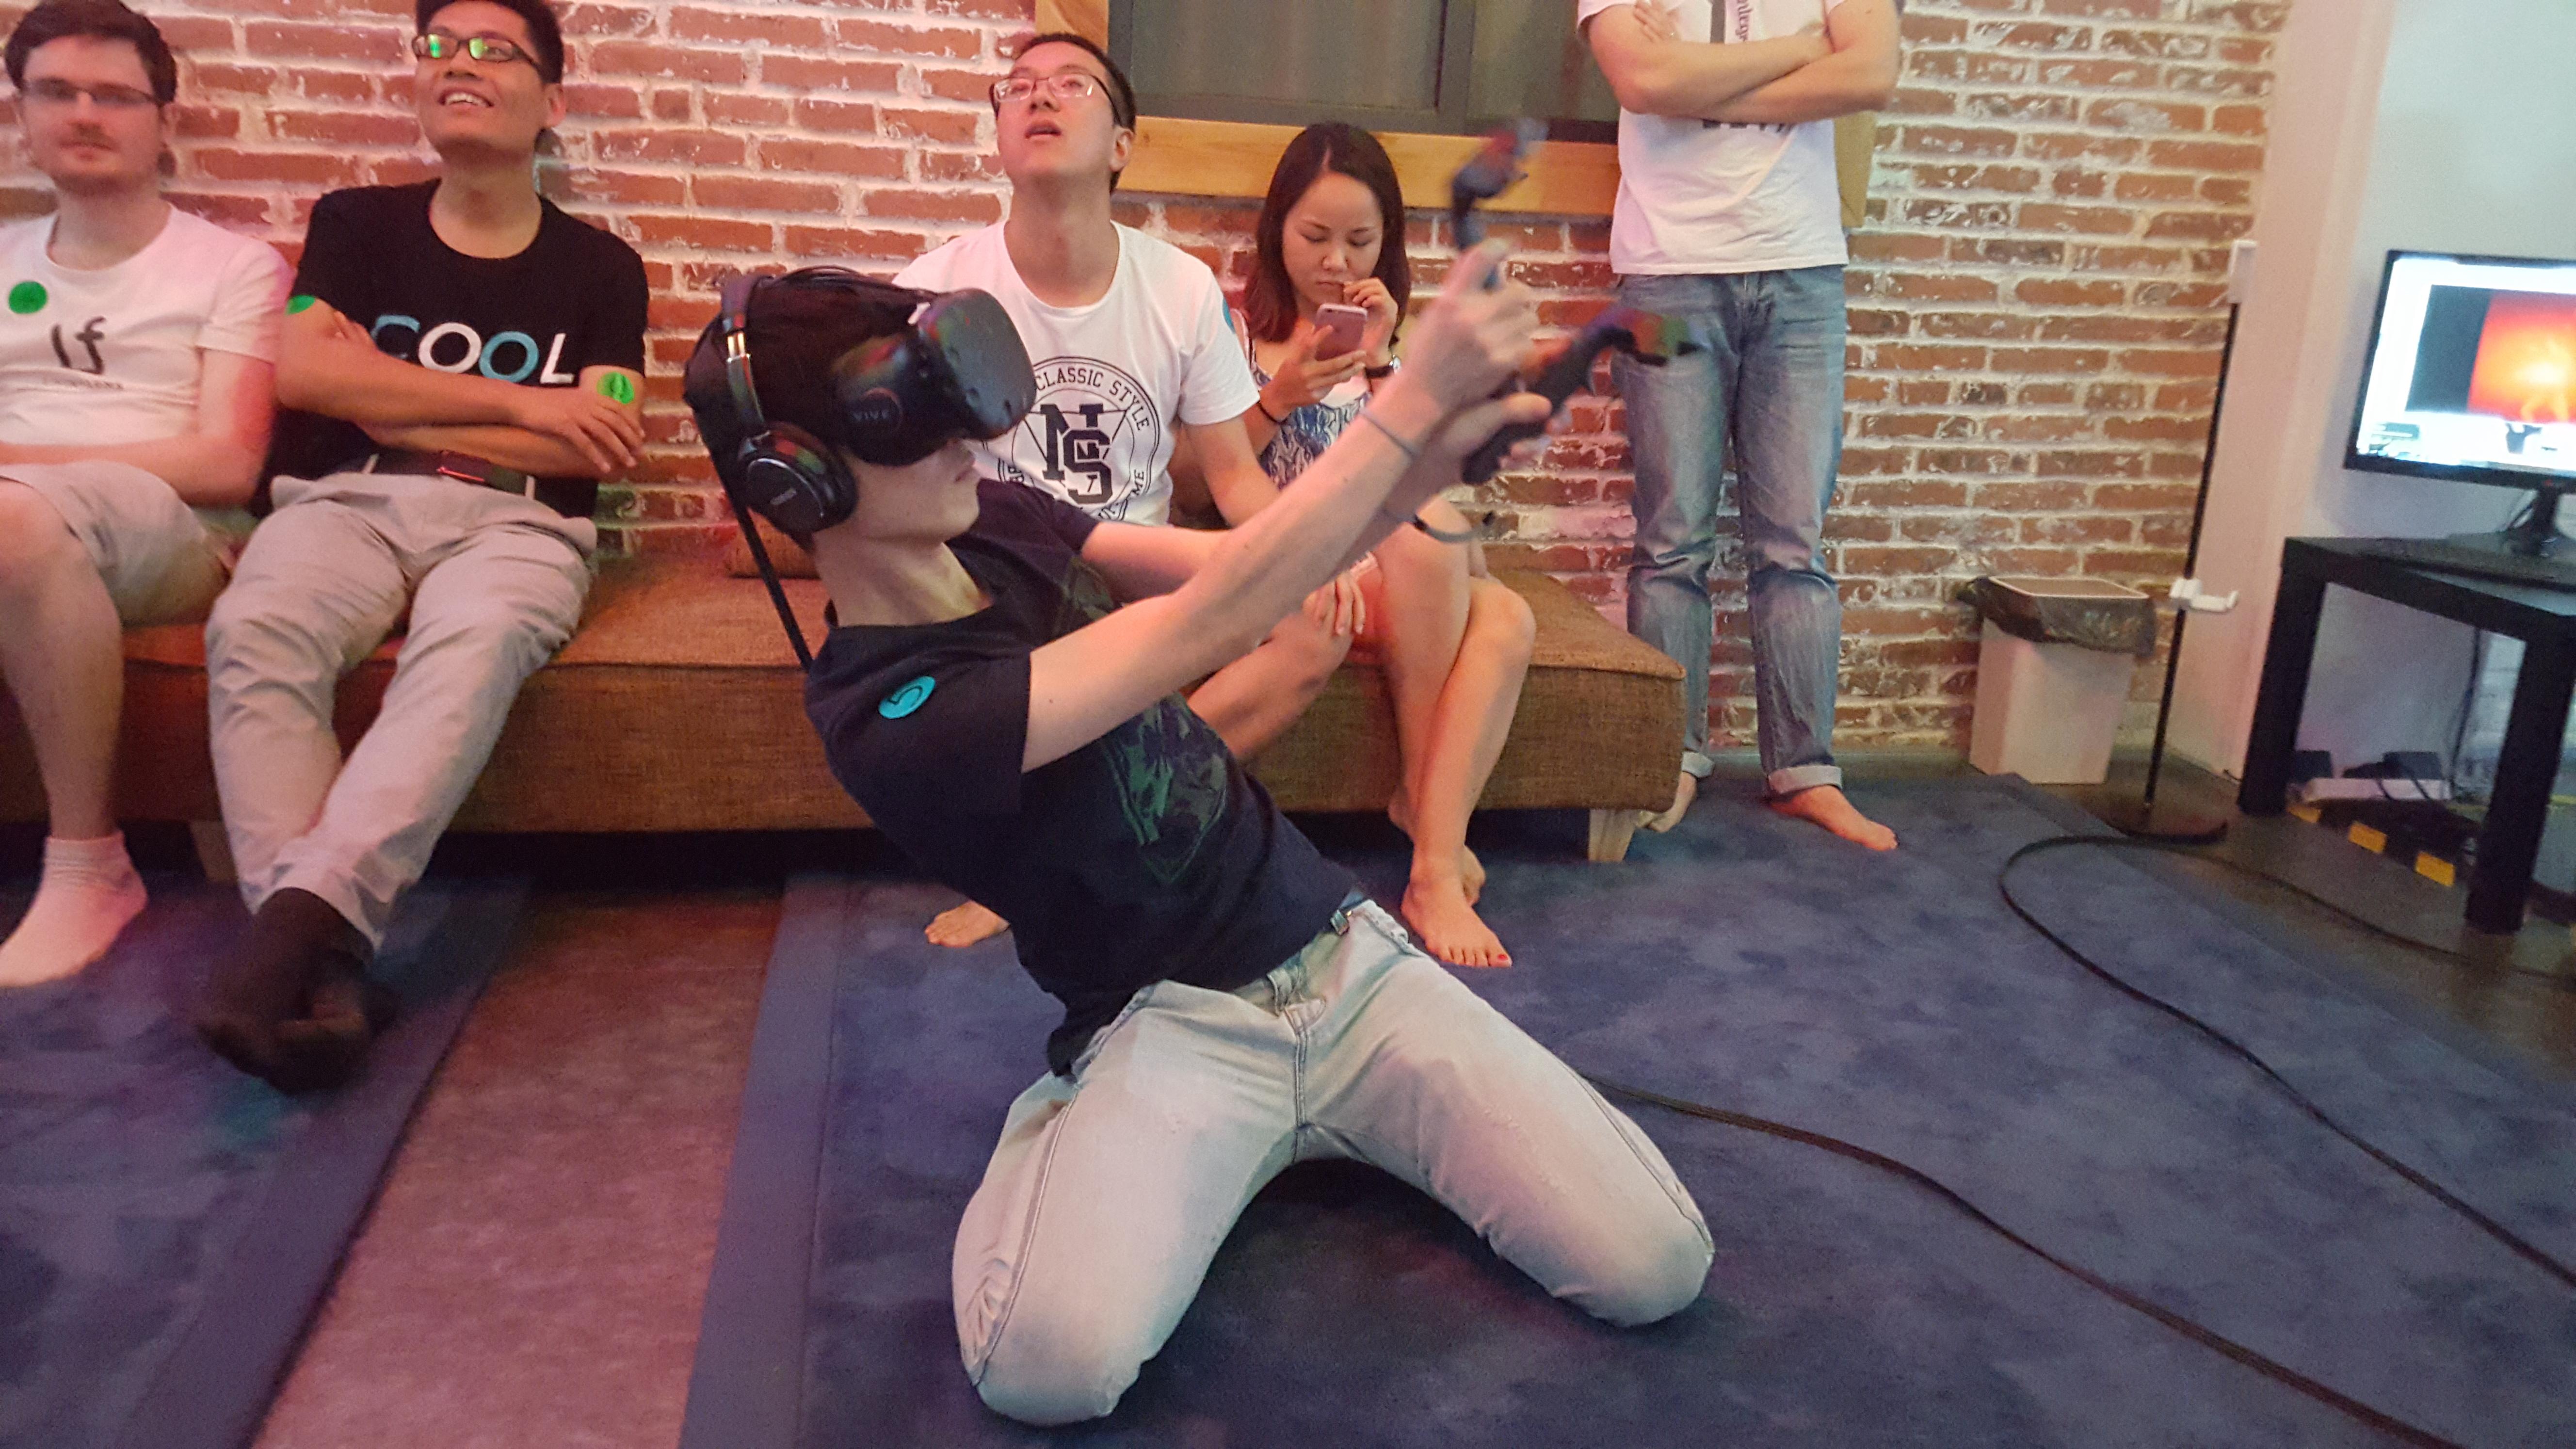 VR Lounge shoot